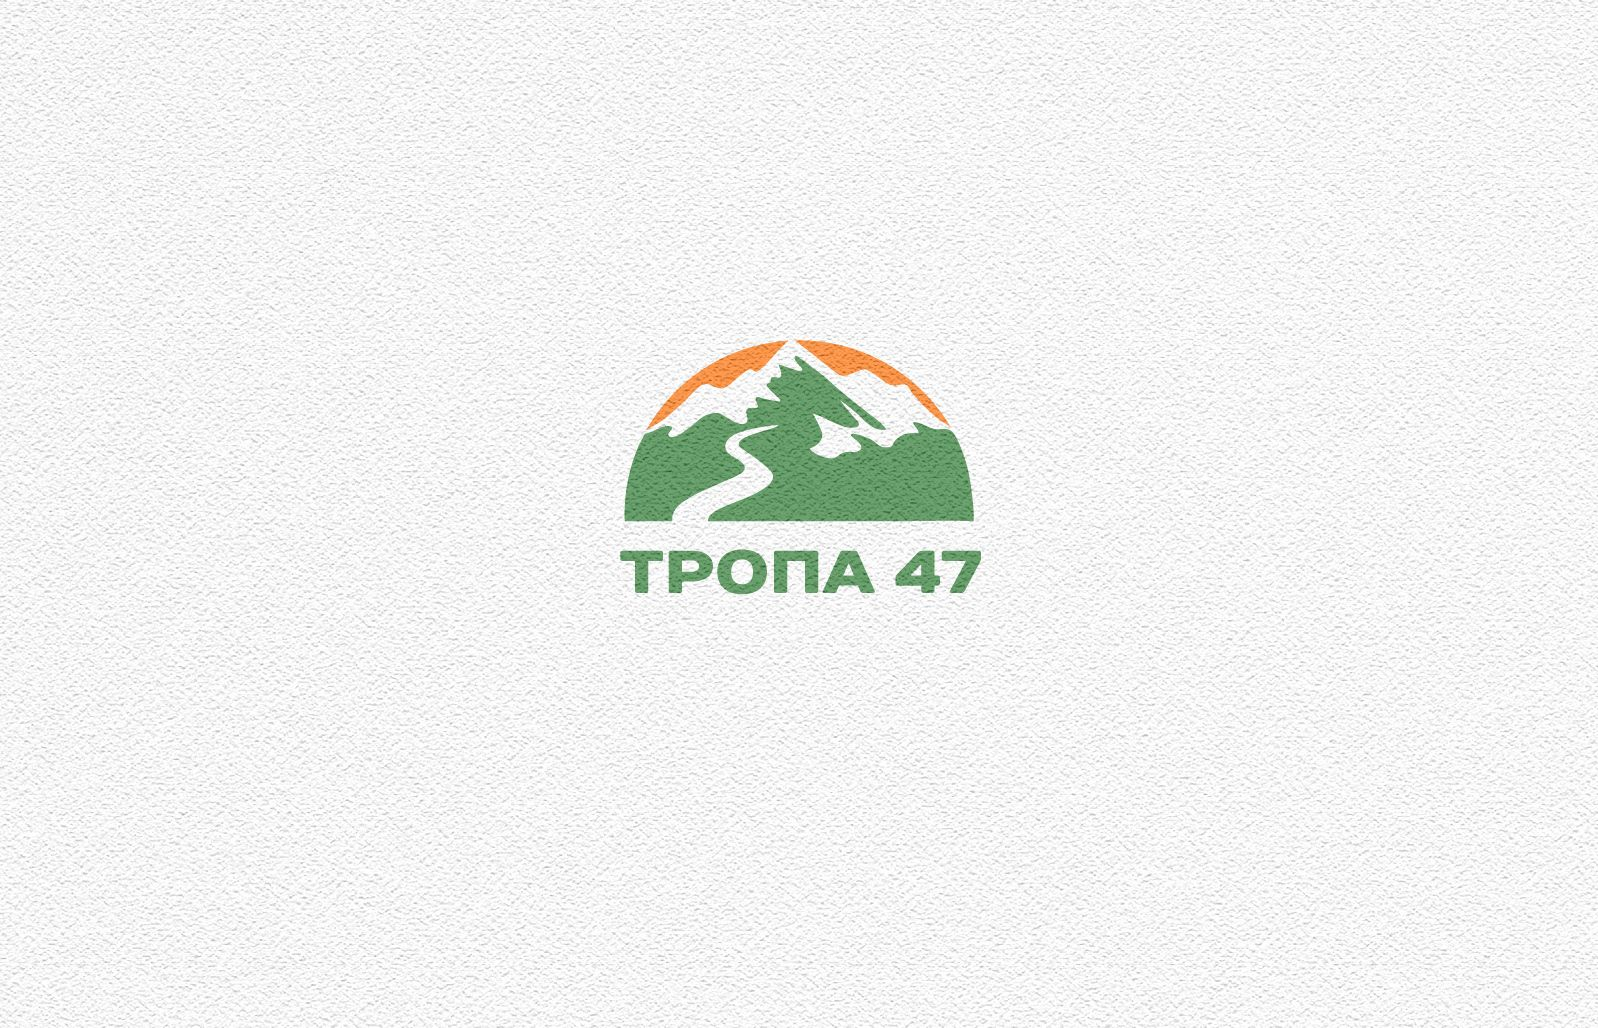 Логотип для Тропа 47 - дизайнер andblin61